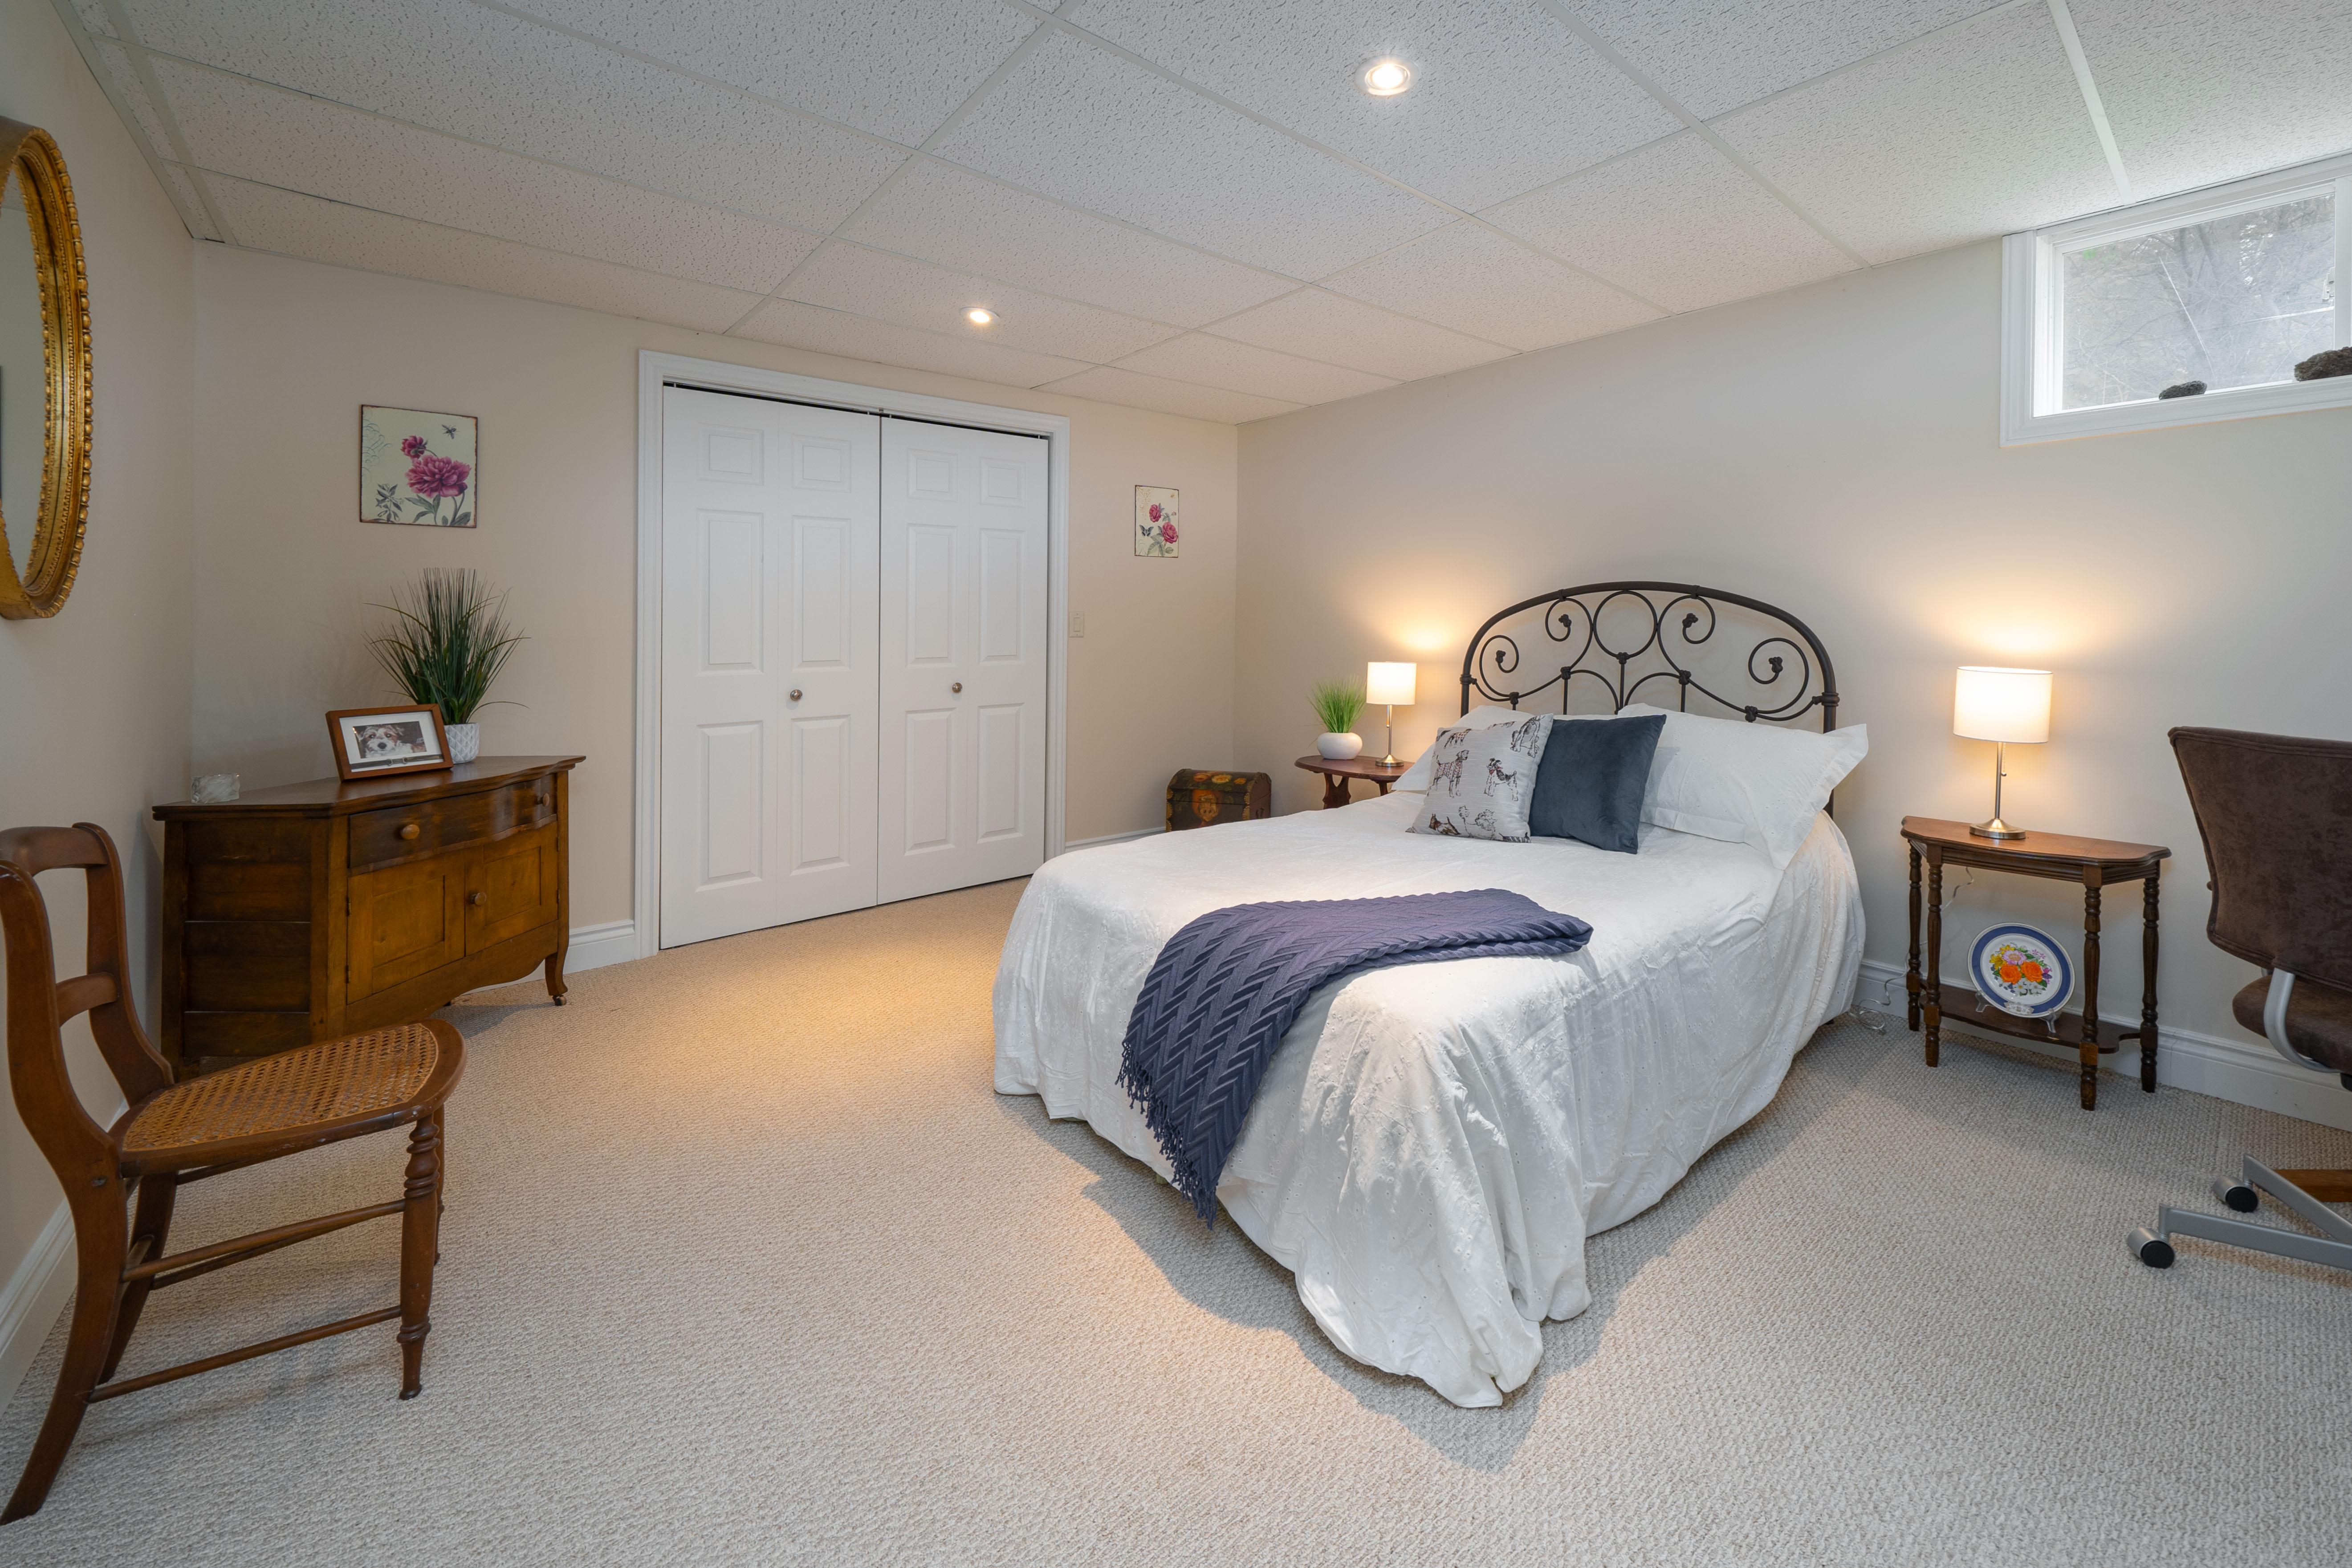 73 Ridge Road - Sold!!, Picton, Ontario  K0K 2T0 - Photo 16 - 227729